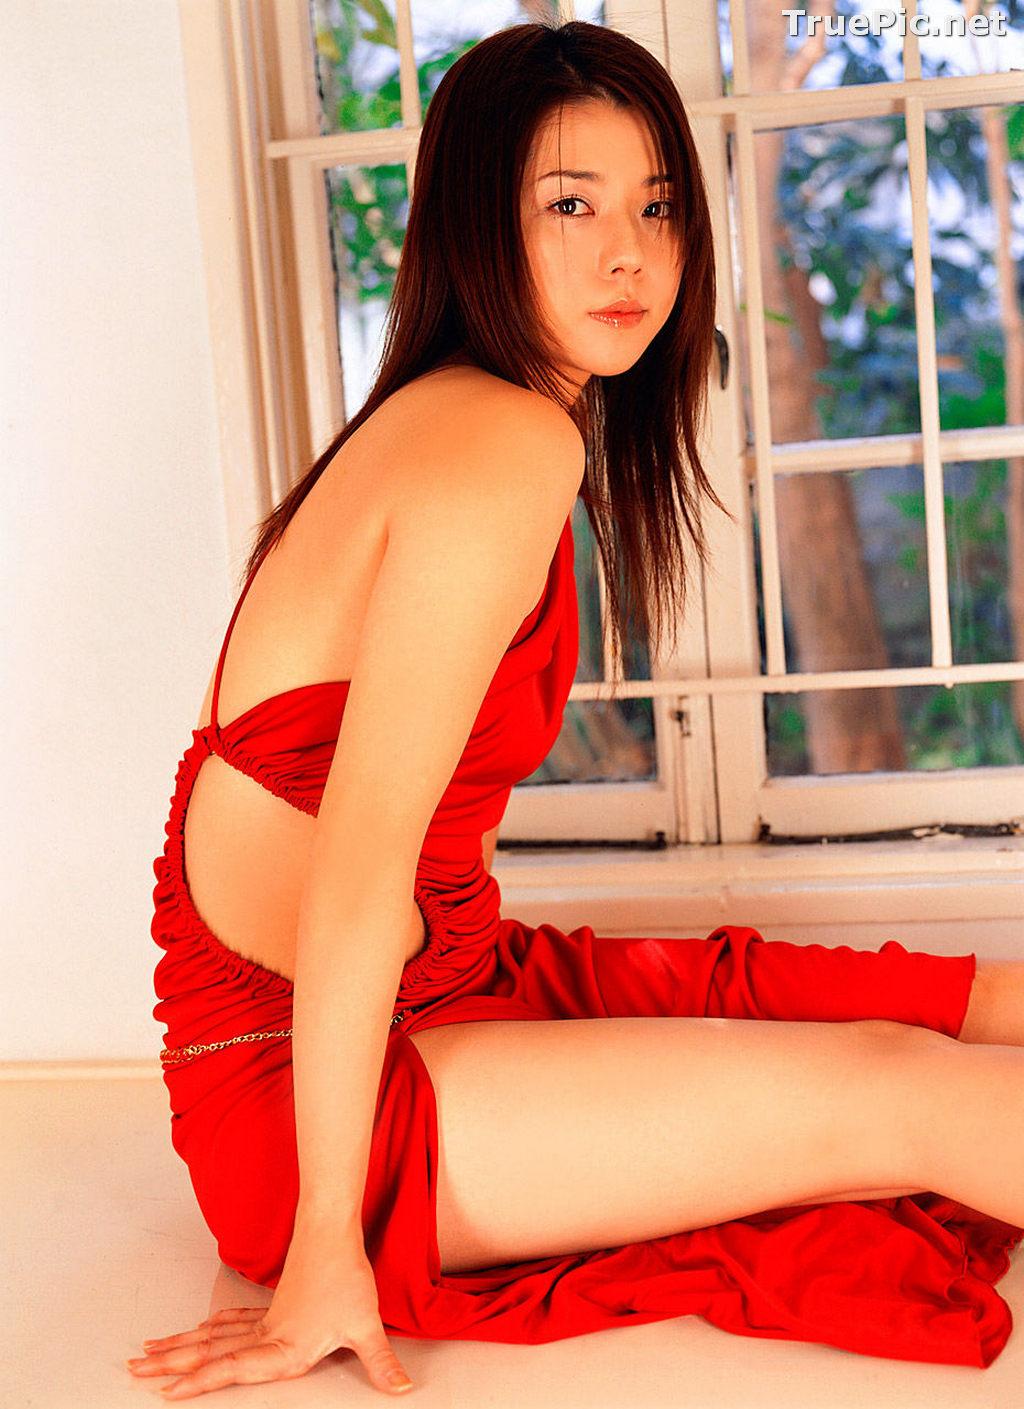 Image Japanese Tarento and Gravure Idol - Miho Yoshioka - Secret Colors Photo - TruePic.net - Picture-7